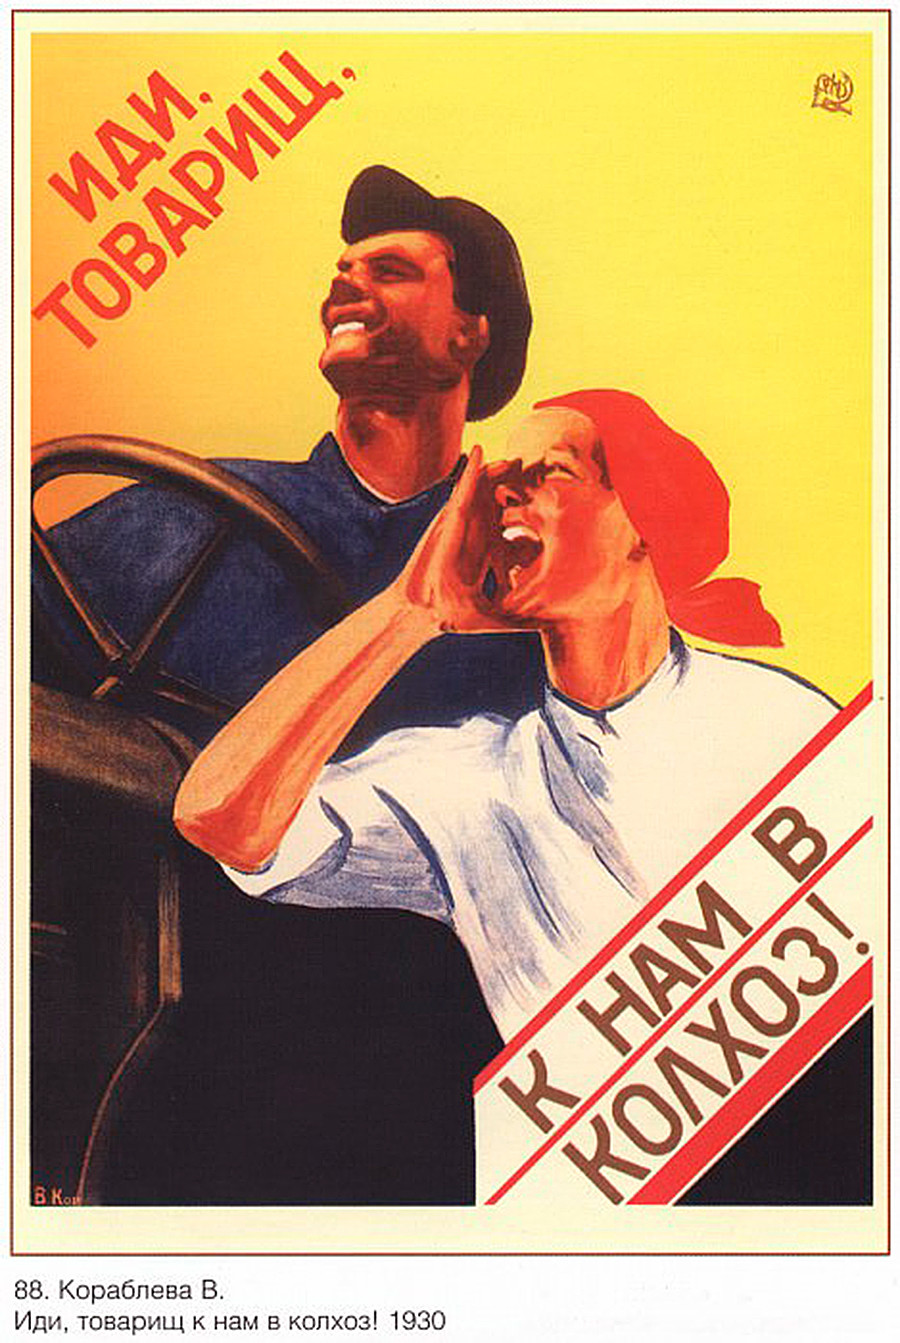 « Viens, camarade, dans notre kolkhoze »